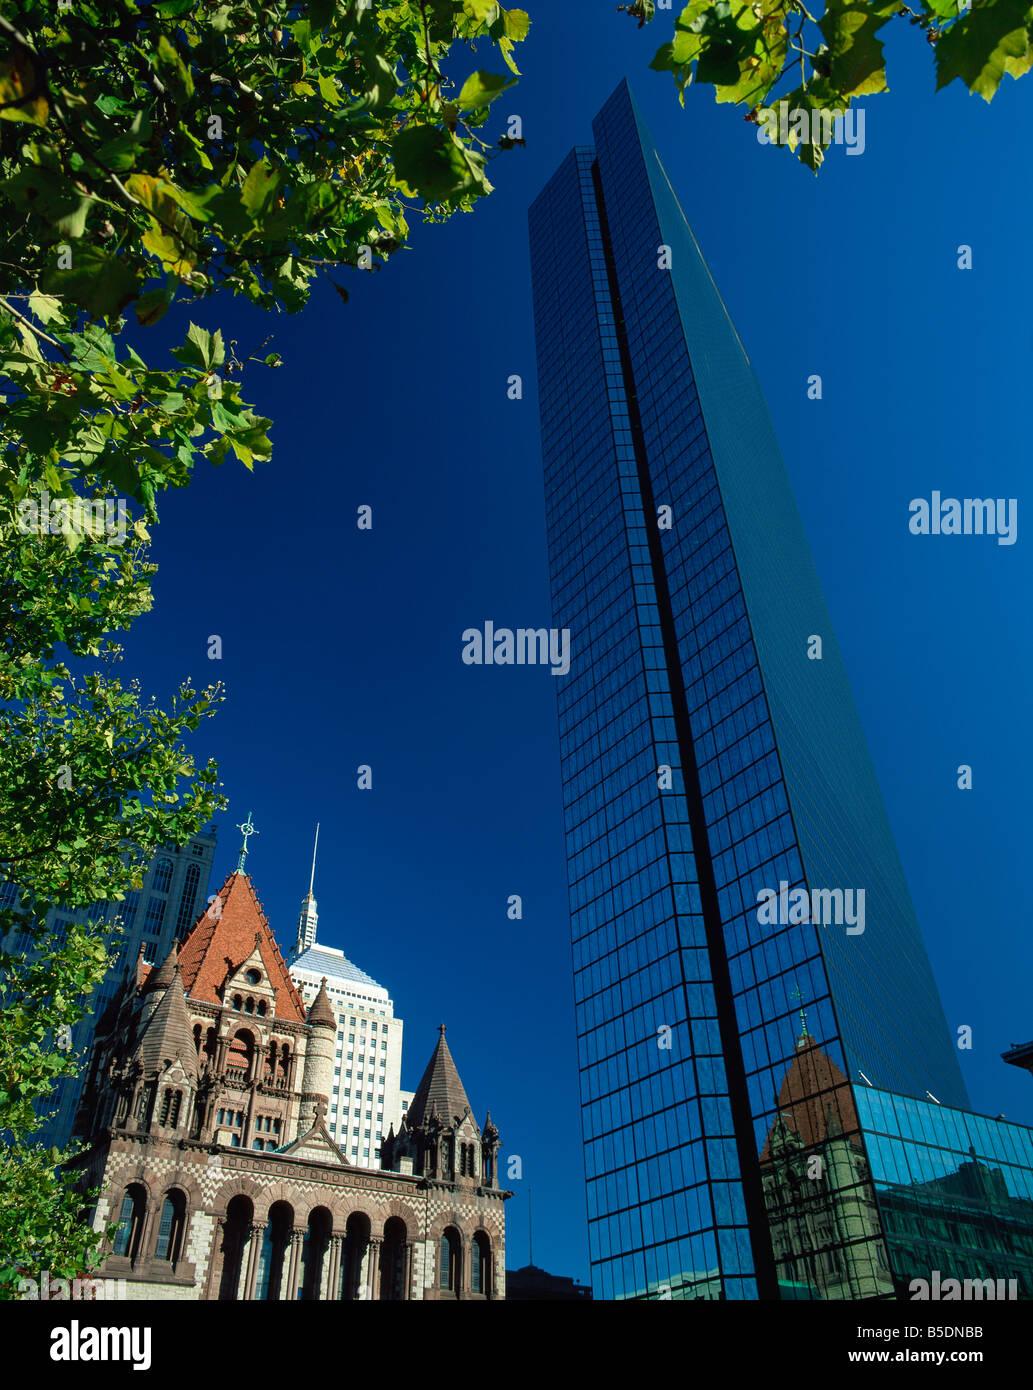 John Hancock Tower Boston Massachussetts United States of America North America - Stock Image